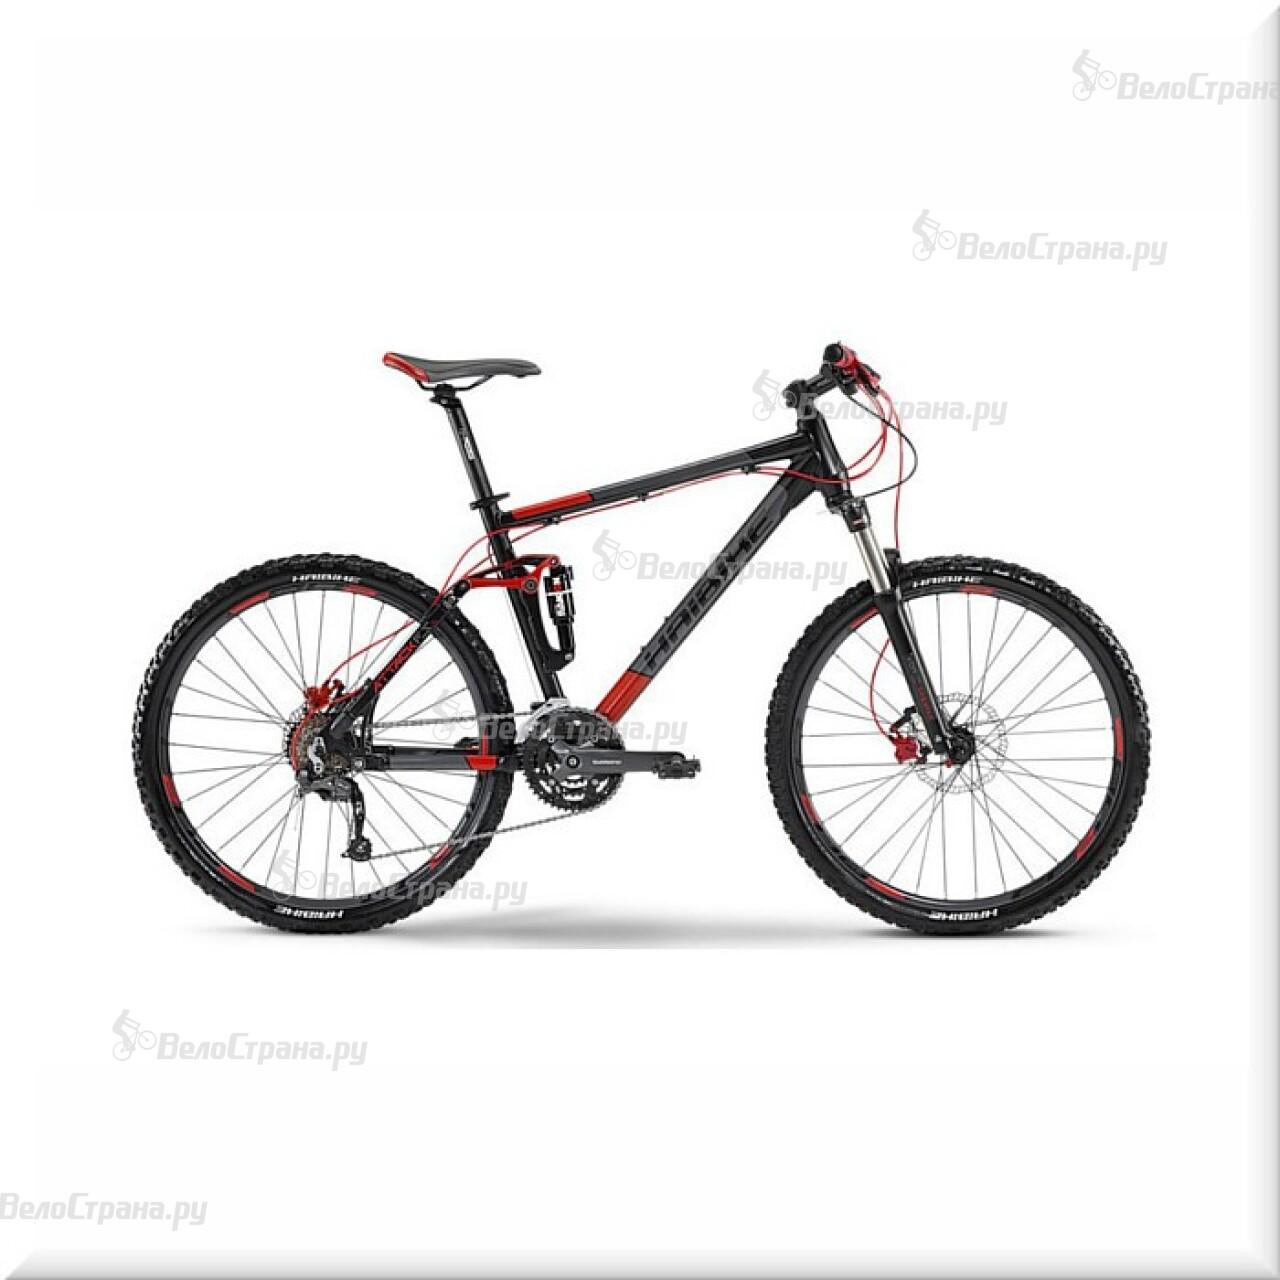 Велосипед Haibike Attack FS (2014) велосипед challenger mission lux fs 26 черно красный 16